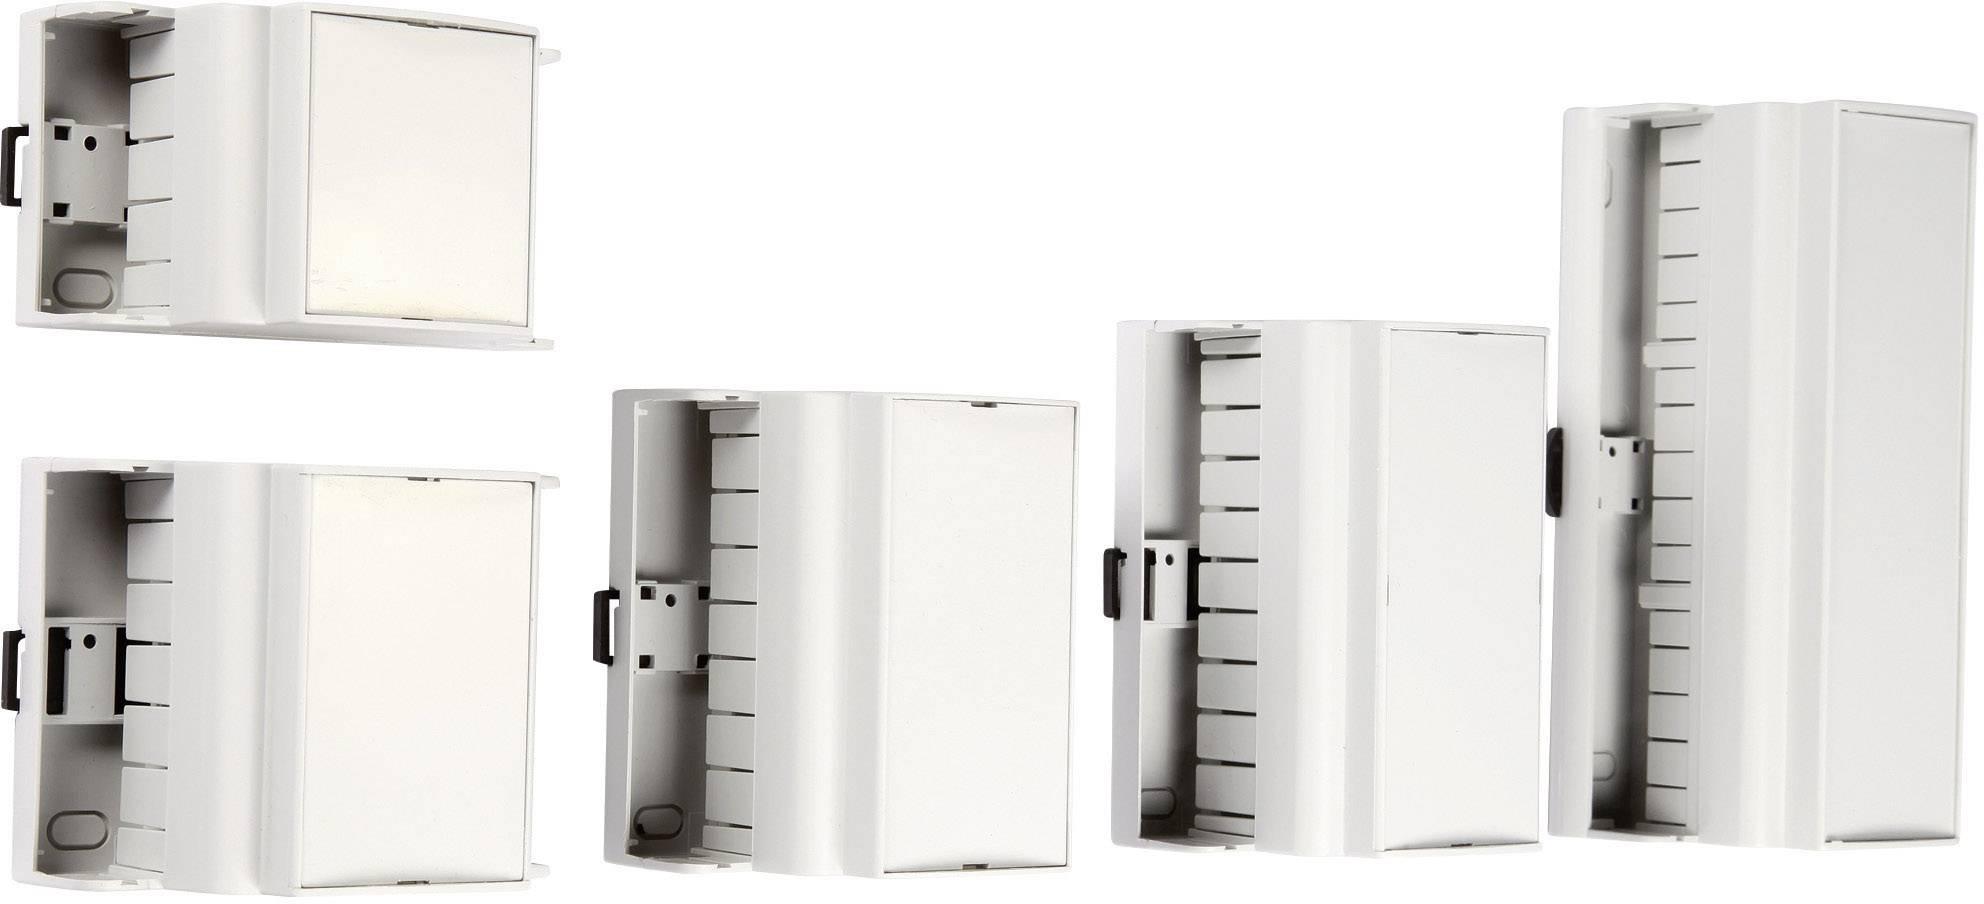 Pouzdro do lišty MR9/K CR RAL7035 ABS (018037087371), 157,5 x 90 x 62 mm